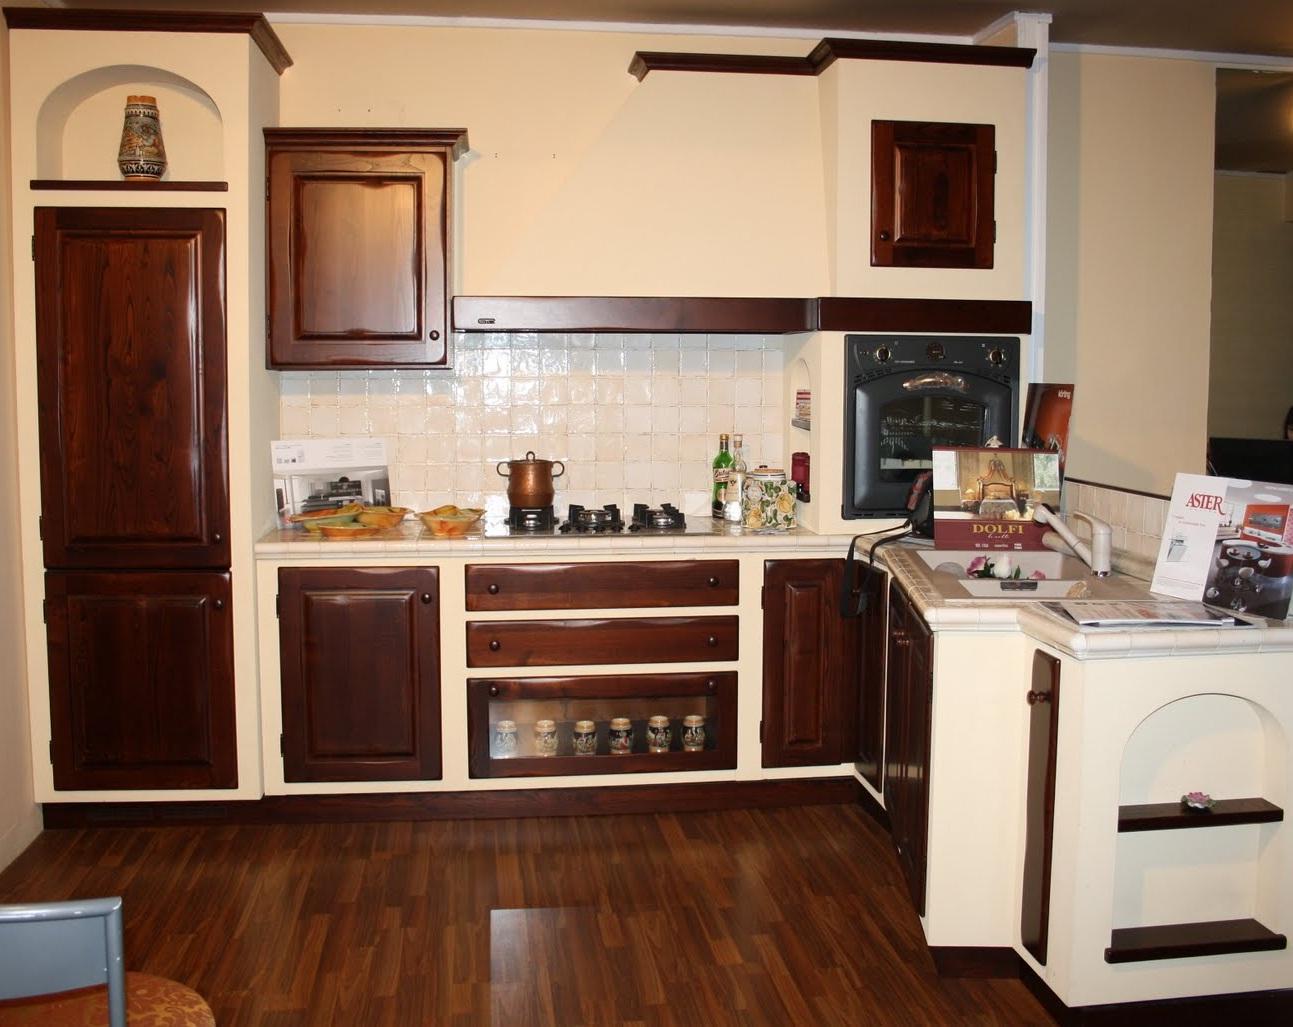 Cucina country usata cucine artigianali arredamento in muratura prezzi cucine - Lady cucine prezzi ...